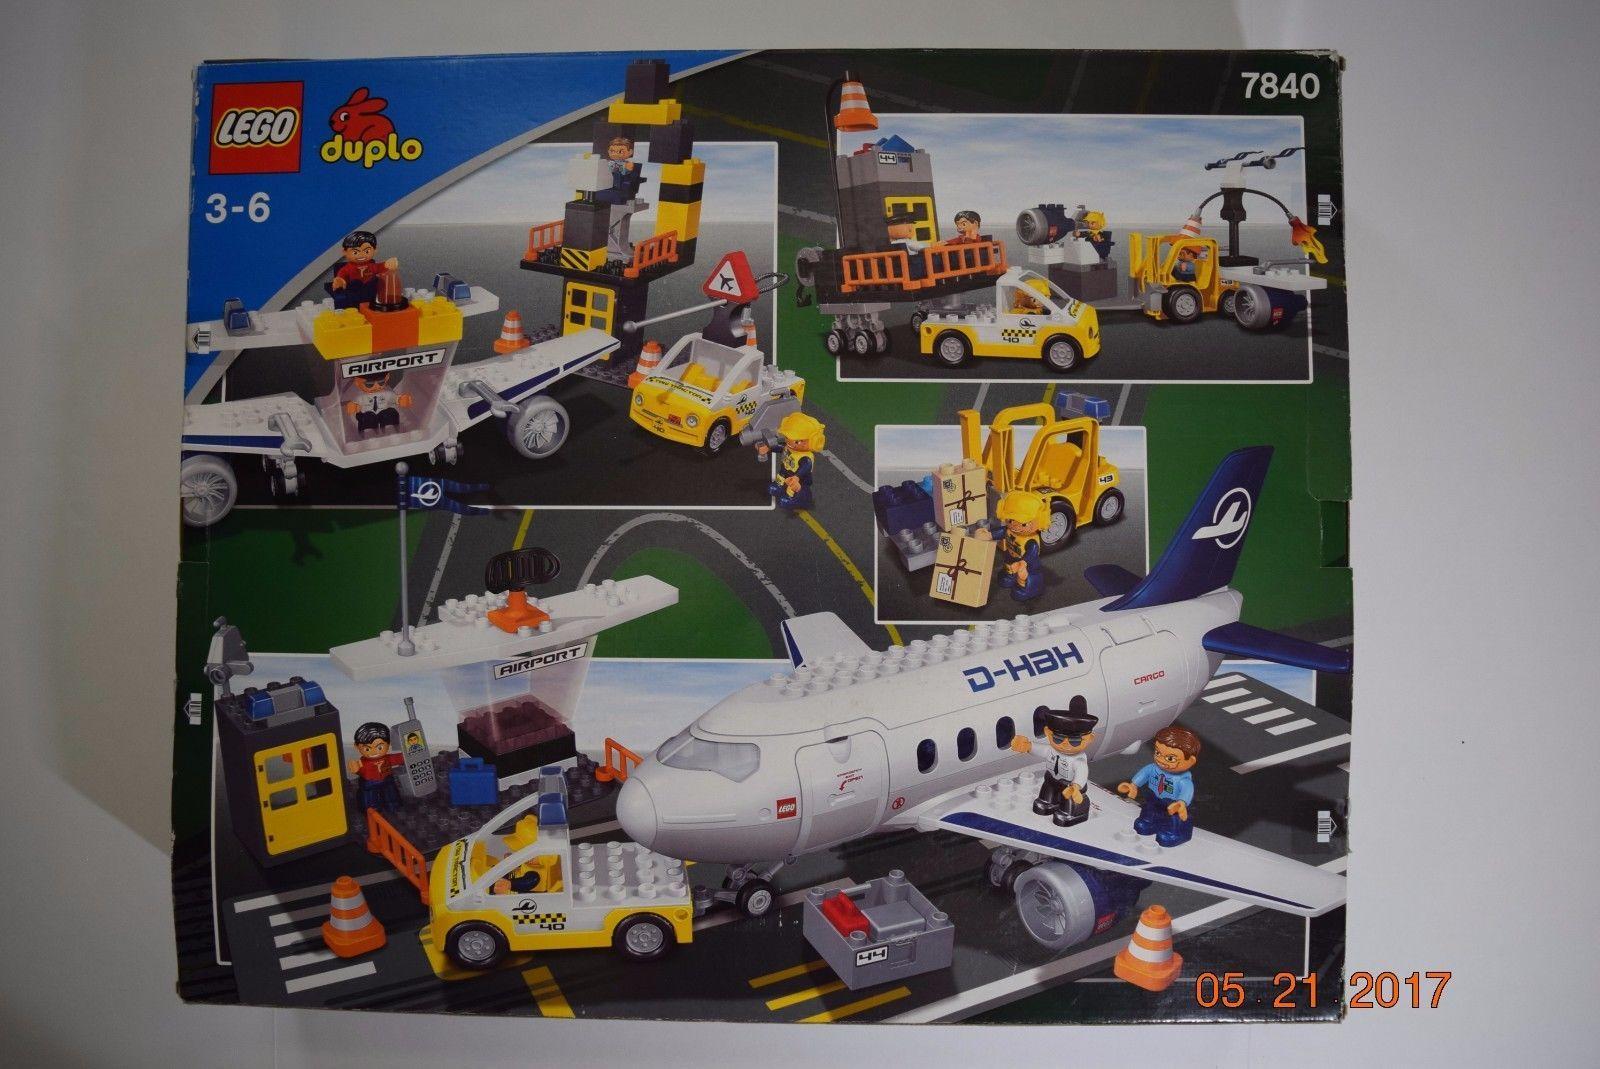 Lego Set~60104retired Airport~large Duplo Airplaneamp; City 7840 see VUzSpGqM